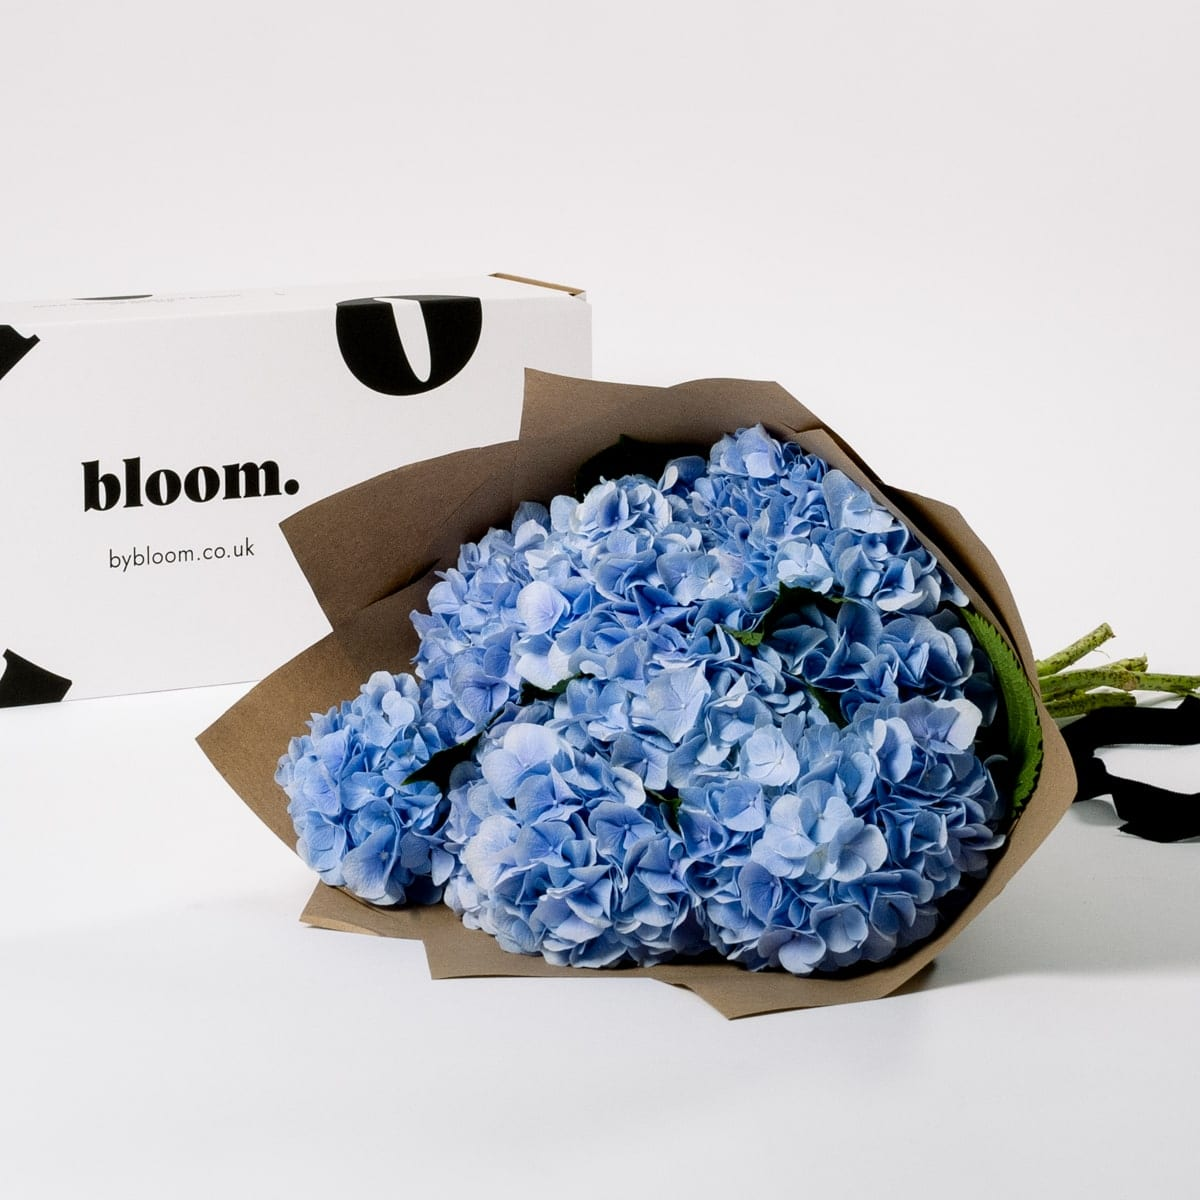 Bloom Flower Delivery | Powder Blue Hydrangea